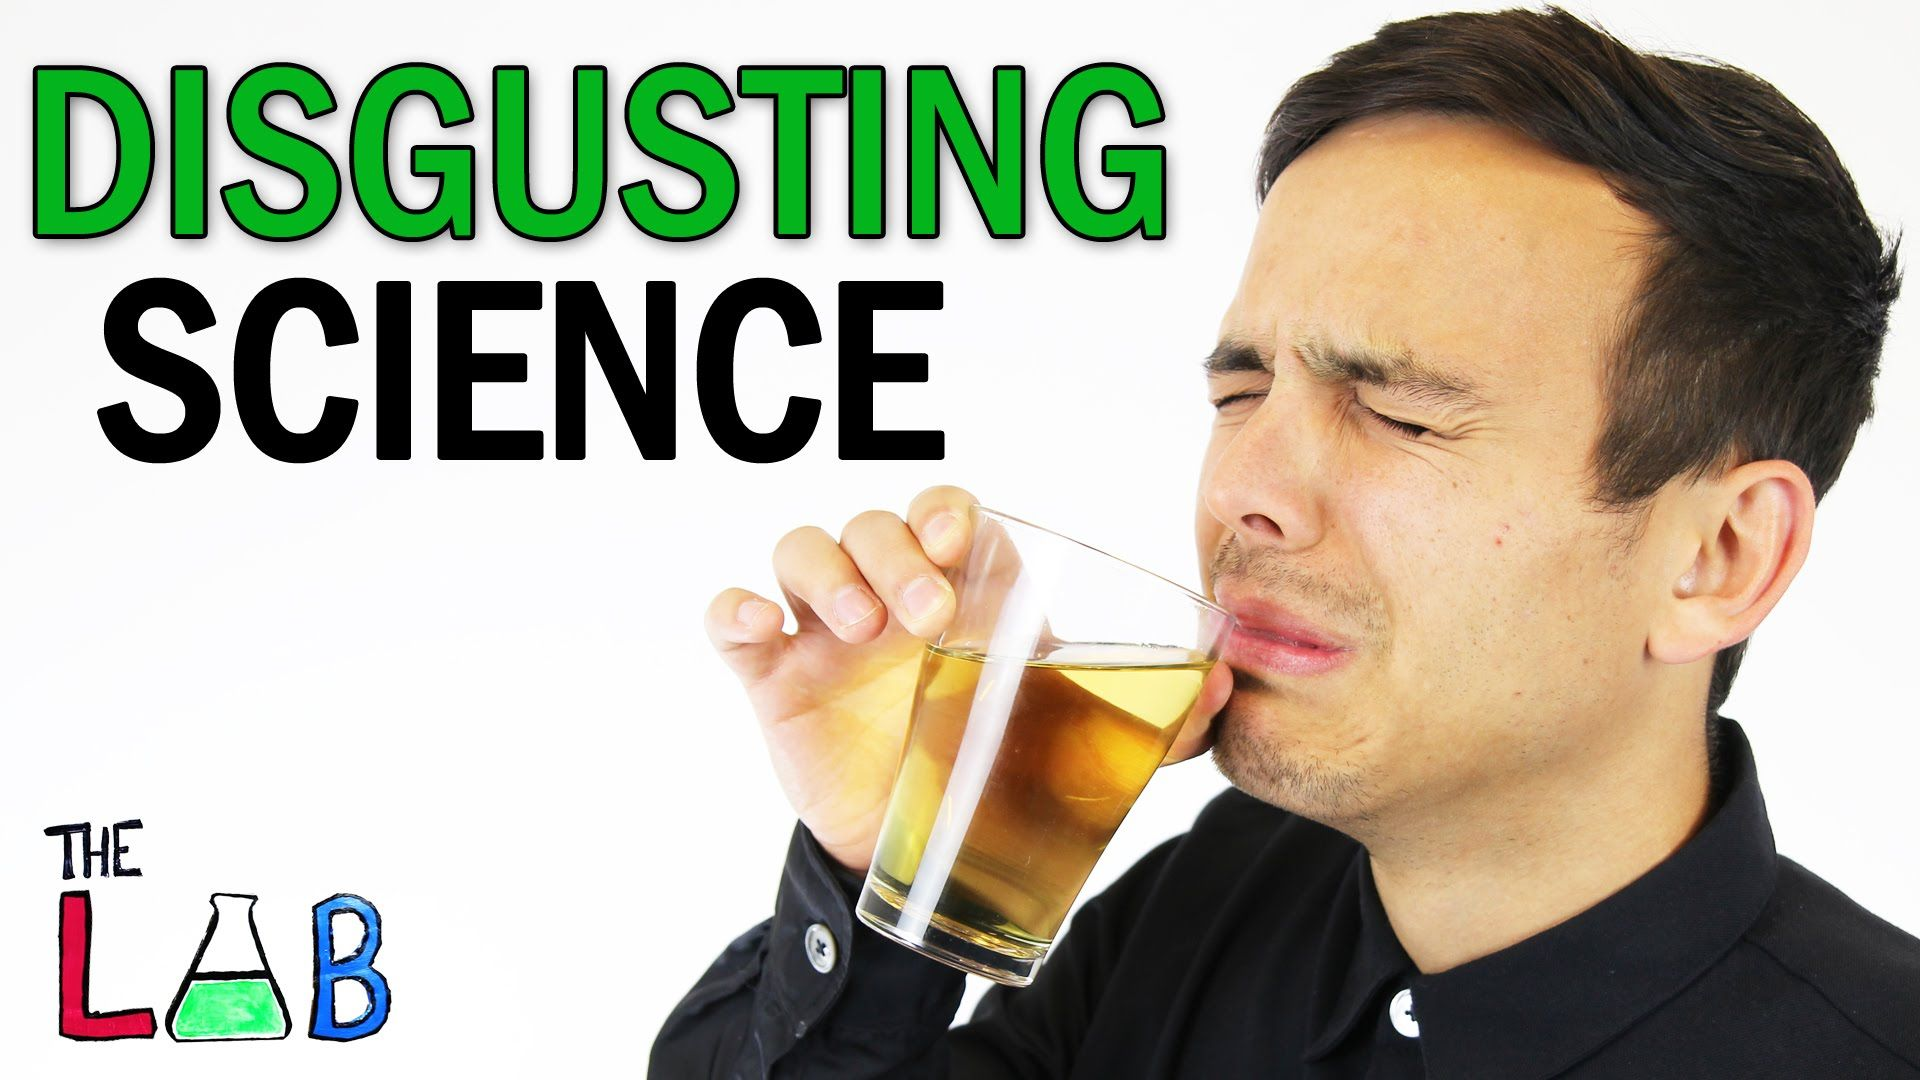 अपना पेशाब पीओ और स्वस्थ रहो - Drinking Your Own Urine Can